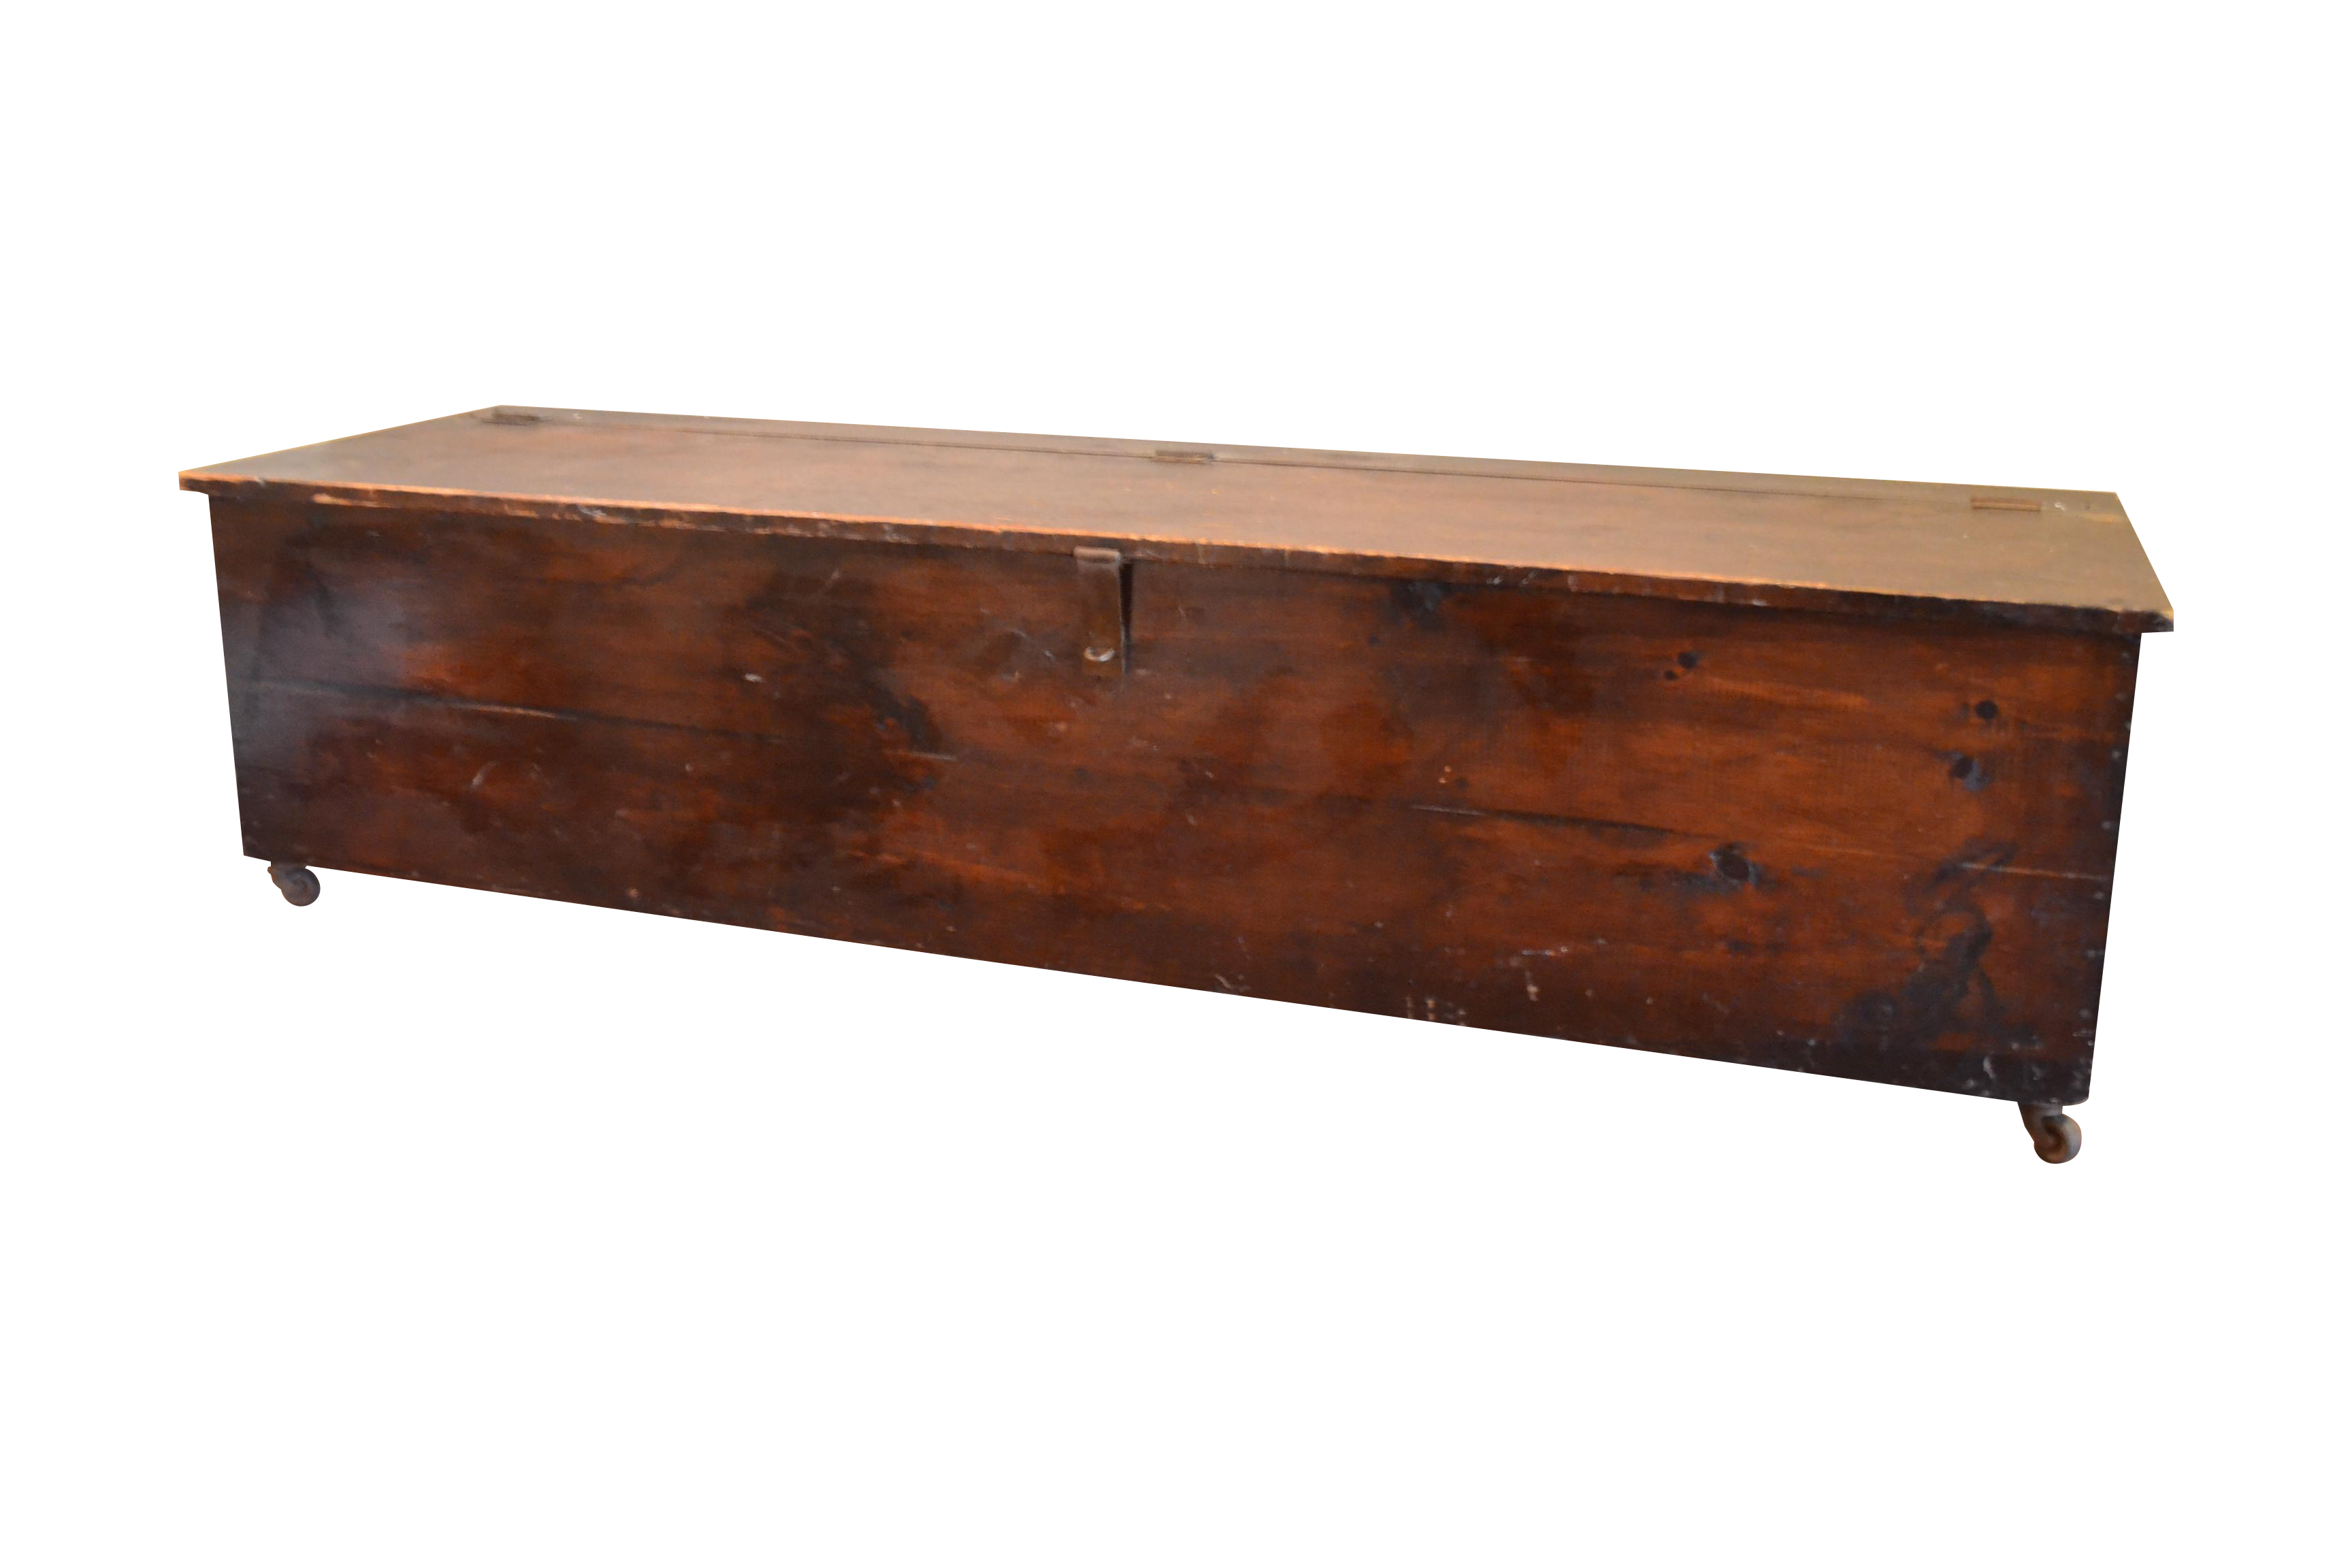 Bon Vintage Solid Wood Rolling Storage Trunk Bench